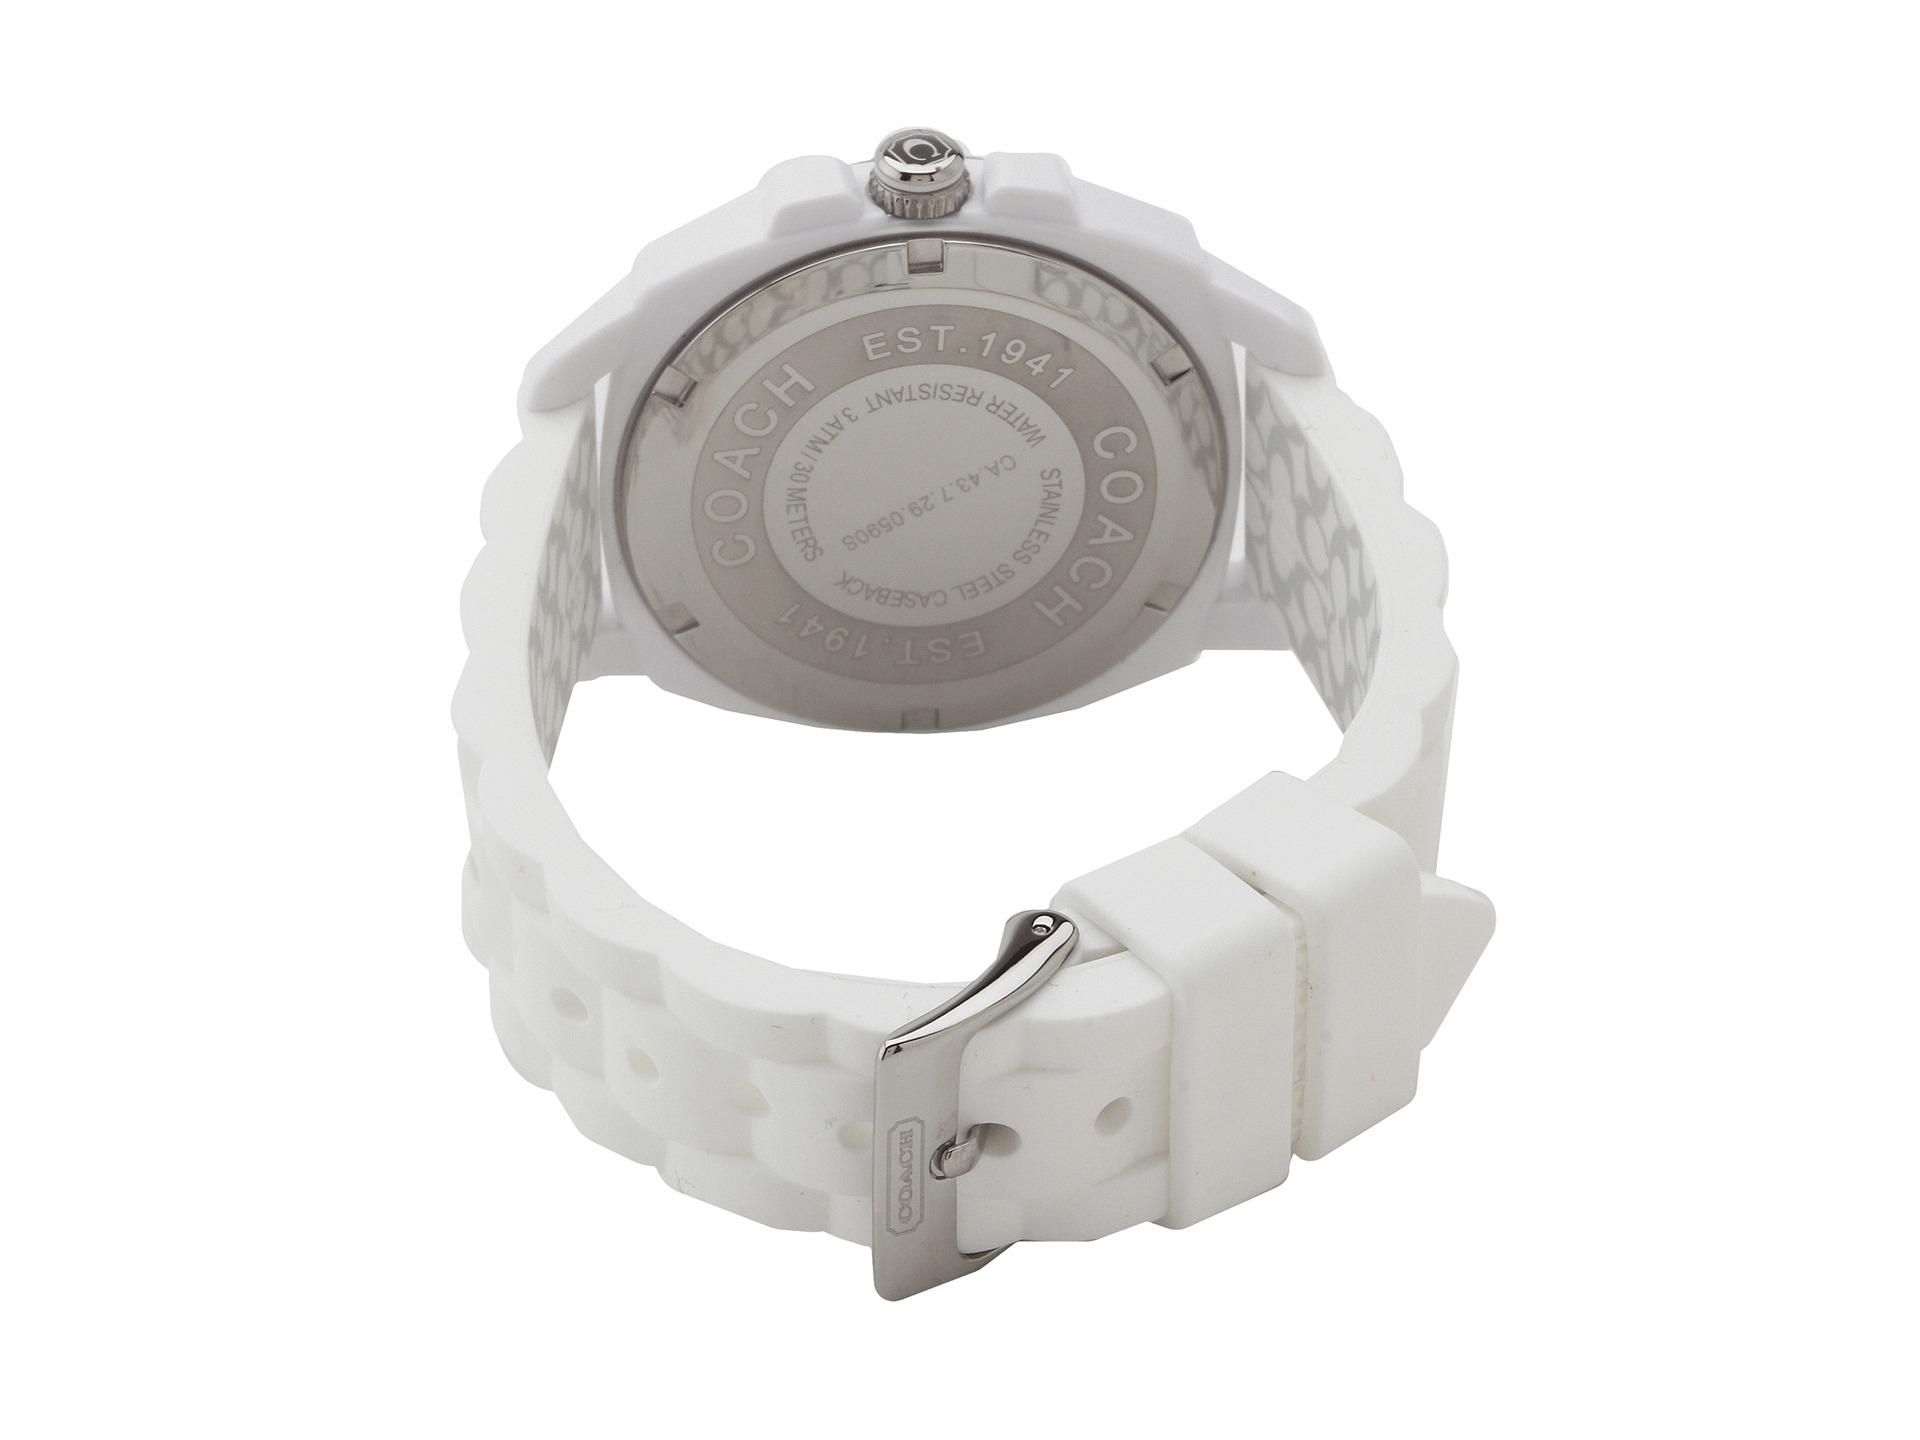 fe455433d COACH Boyfriend Silicone Rubber Strap Watch in White - Lyst